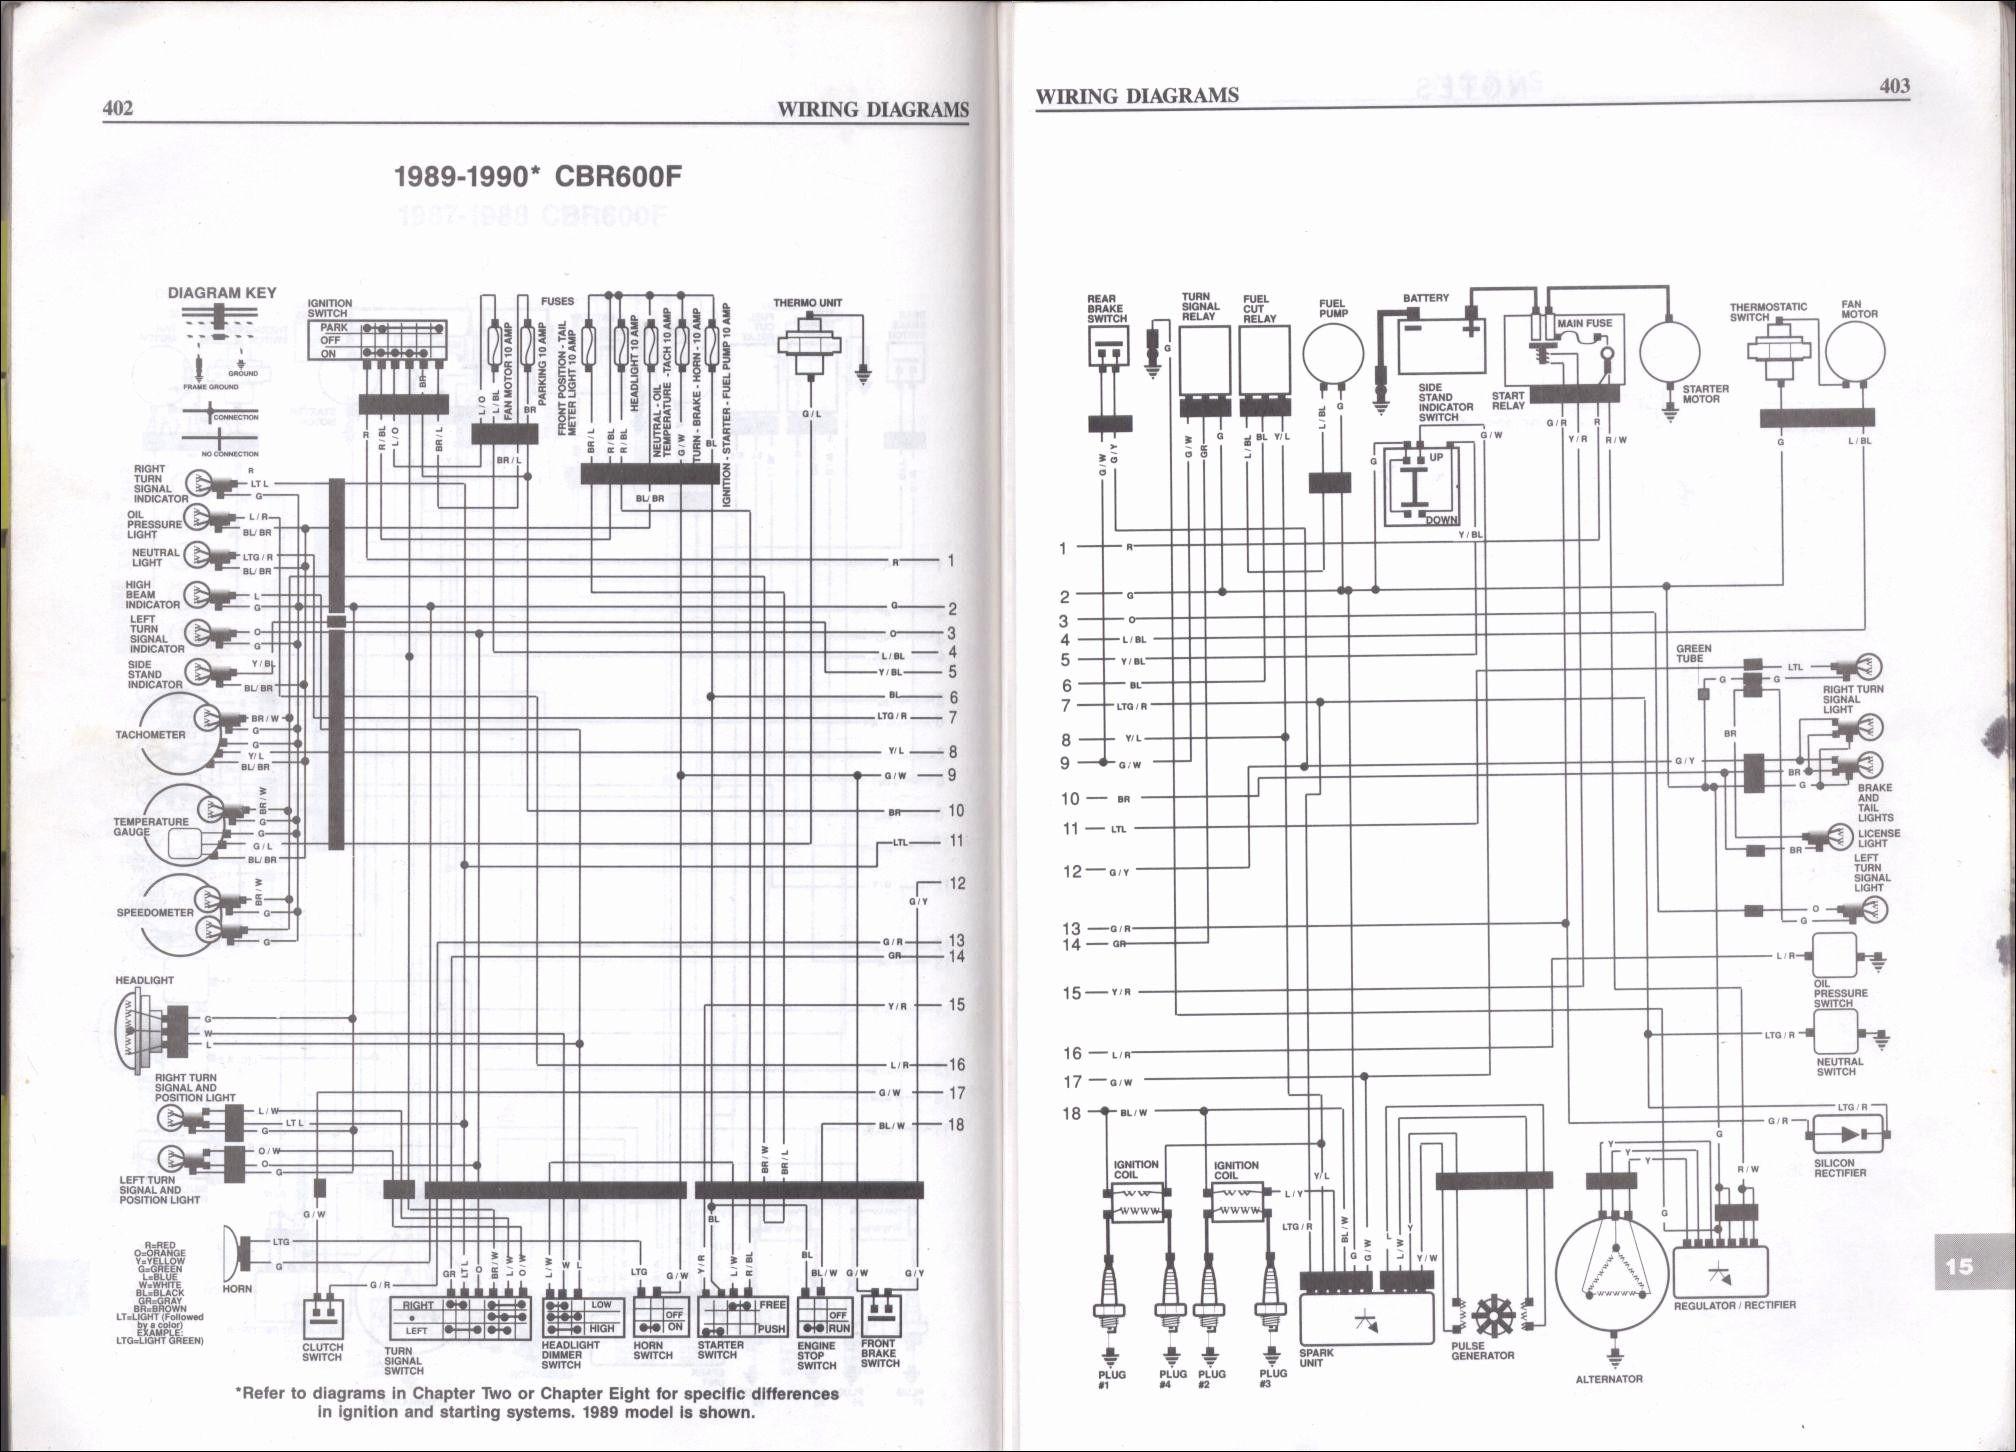 2002 Honda Civic Wiring Schematics Honda C70 Wiring Diagram Auto Electrical Wiring Diagram Of 2002 Honda Civic Wiring Schematics